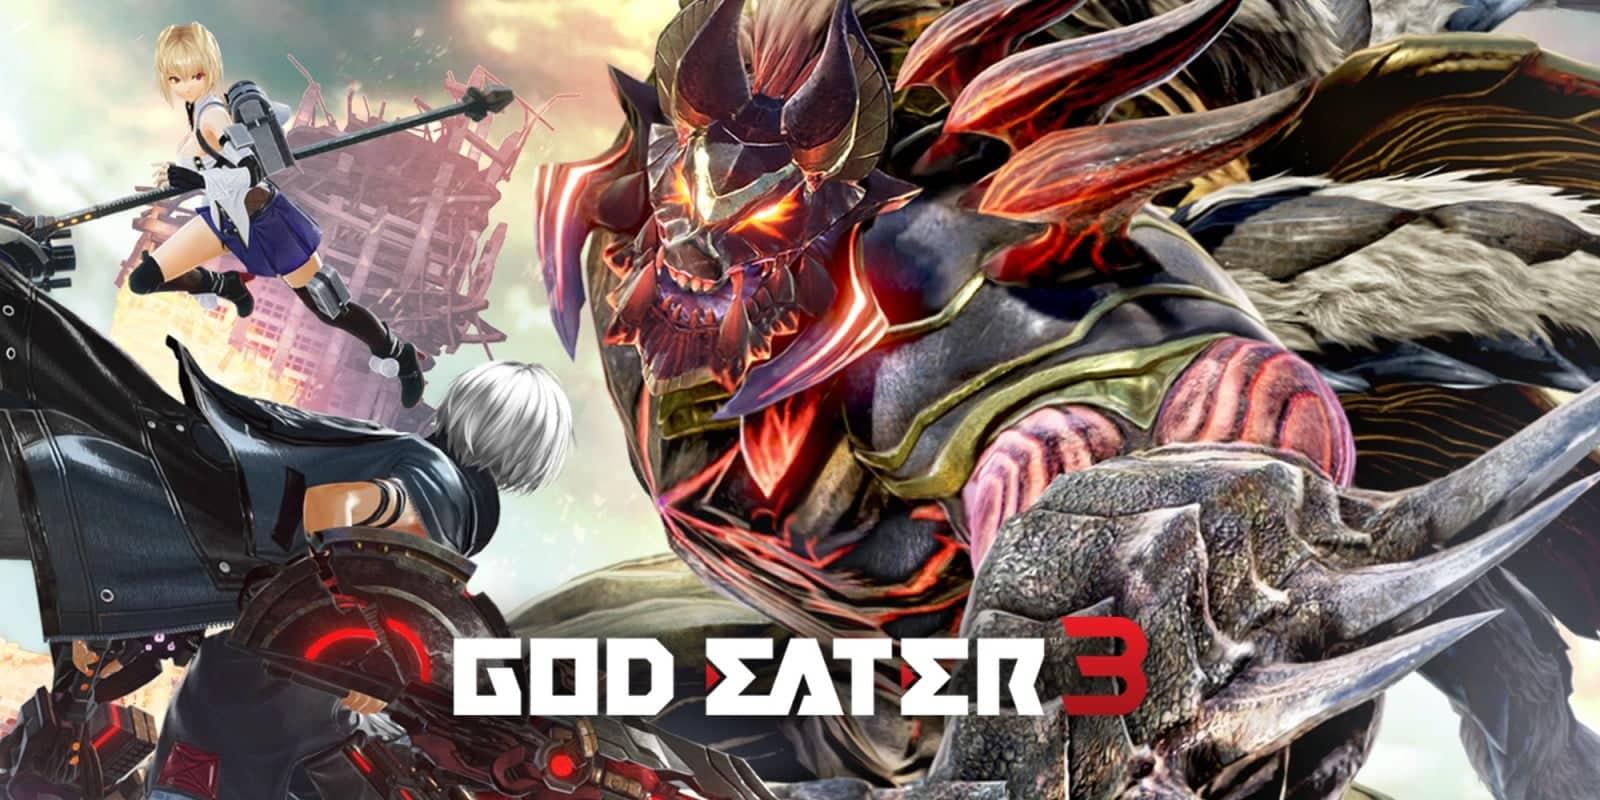 GOD EATER 3 PC Version Full Game Free Download